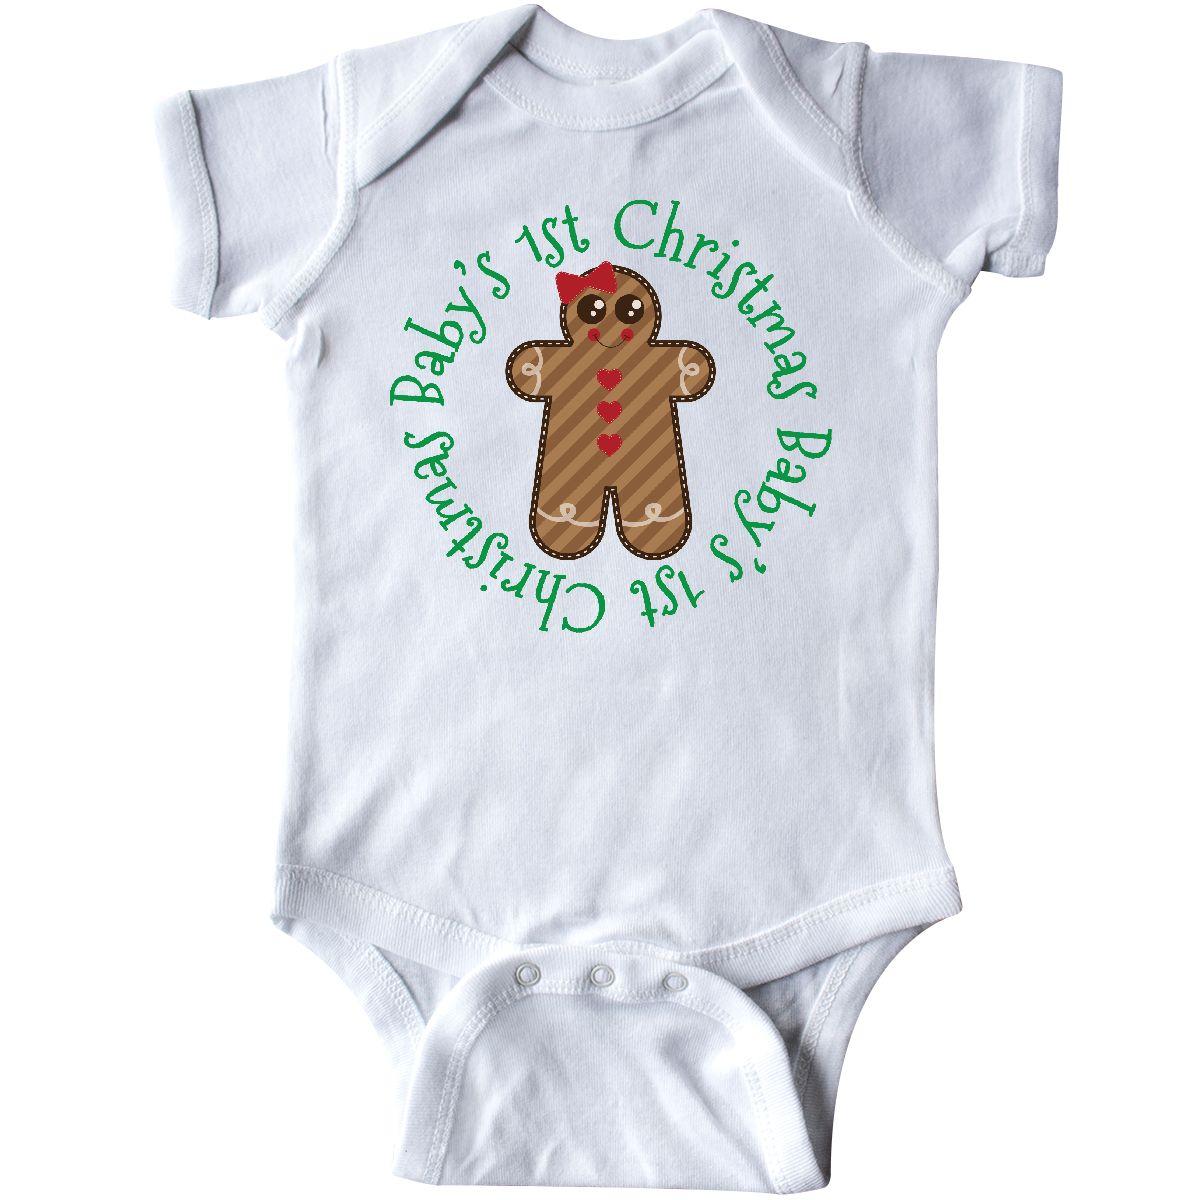 8865dbda8a4d Inktastic Baby First Christmas Gingerbread Girl Infant Bodysuit ...